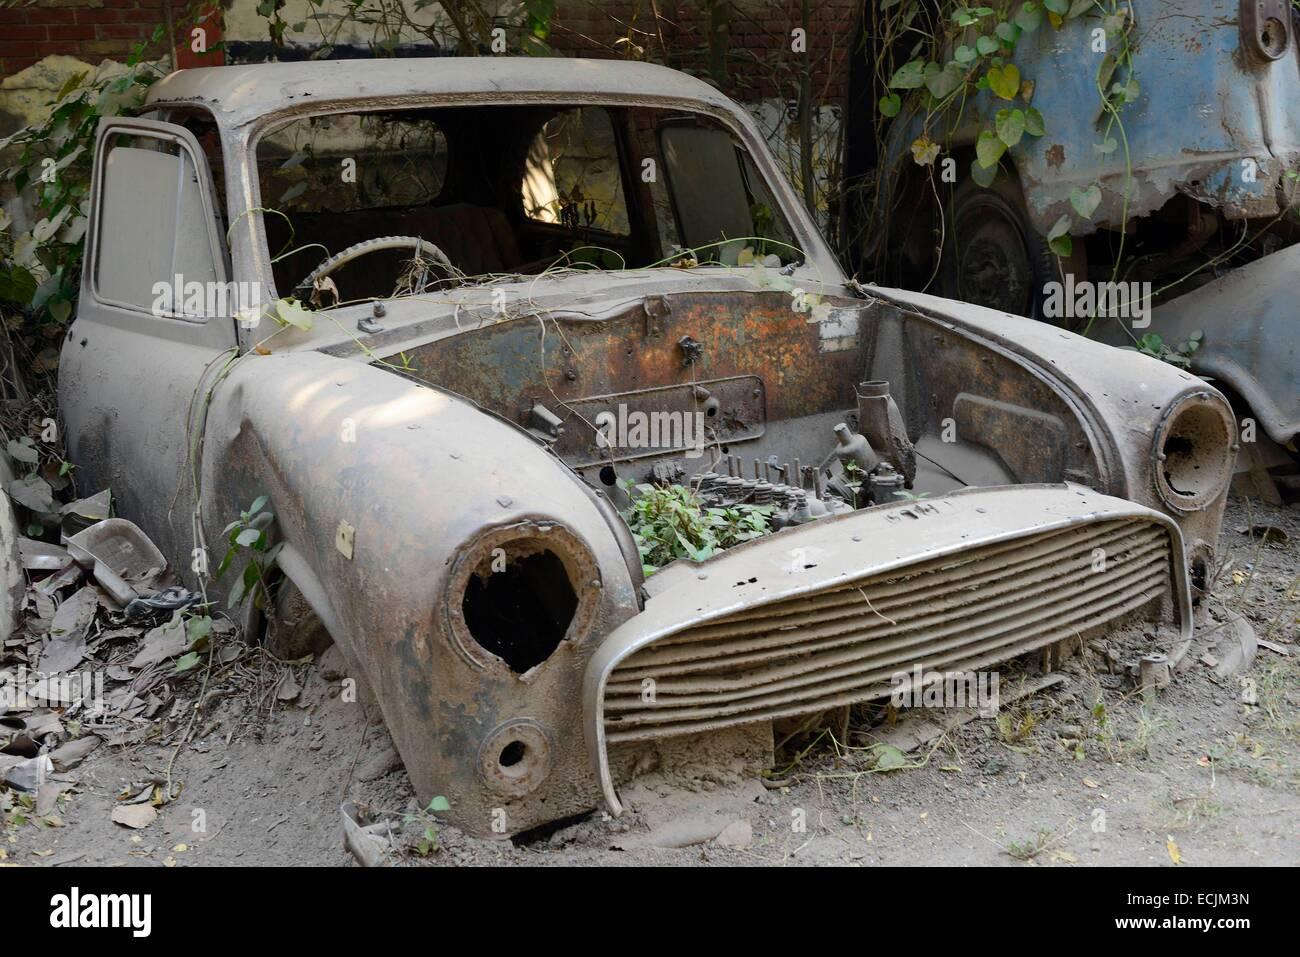 India Uttar Pradesh Lucknow Breaker S Yard Wrecked Ambassador